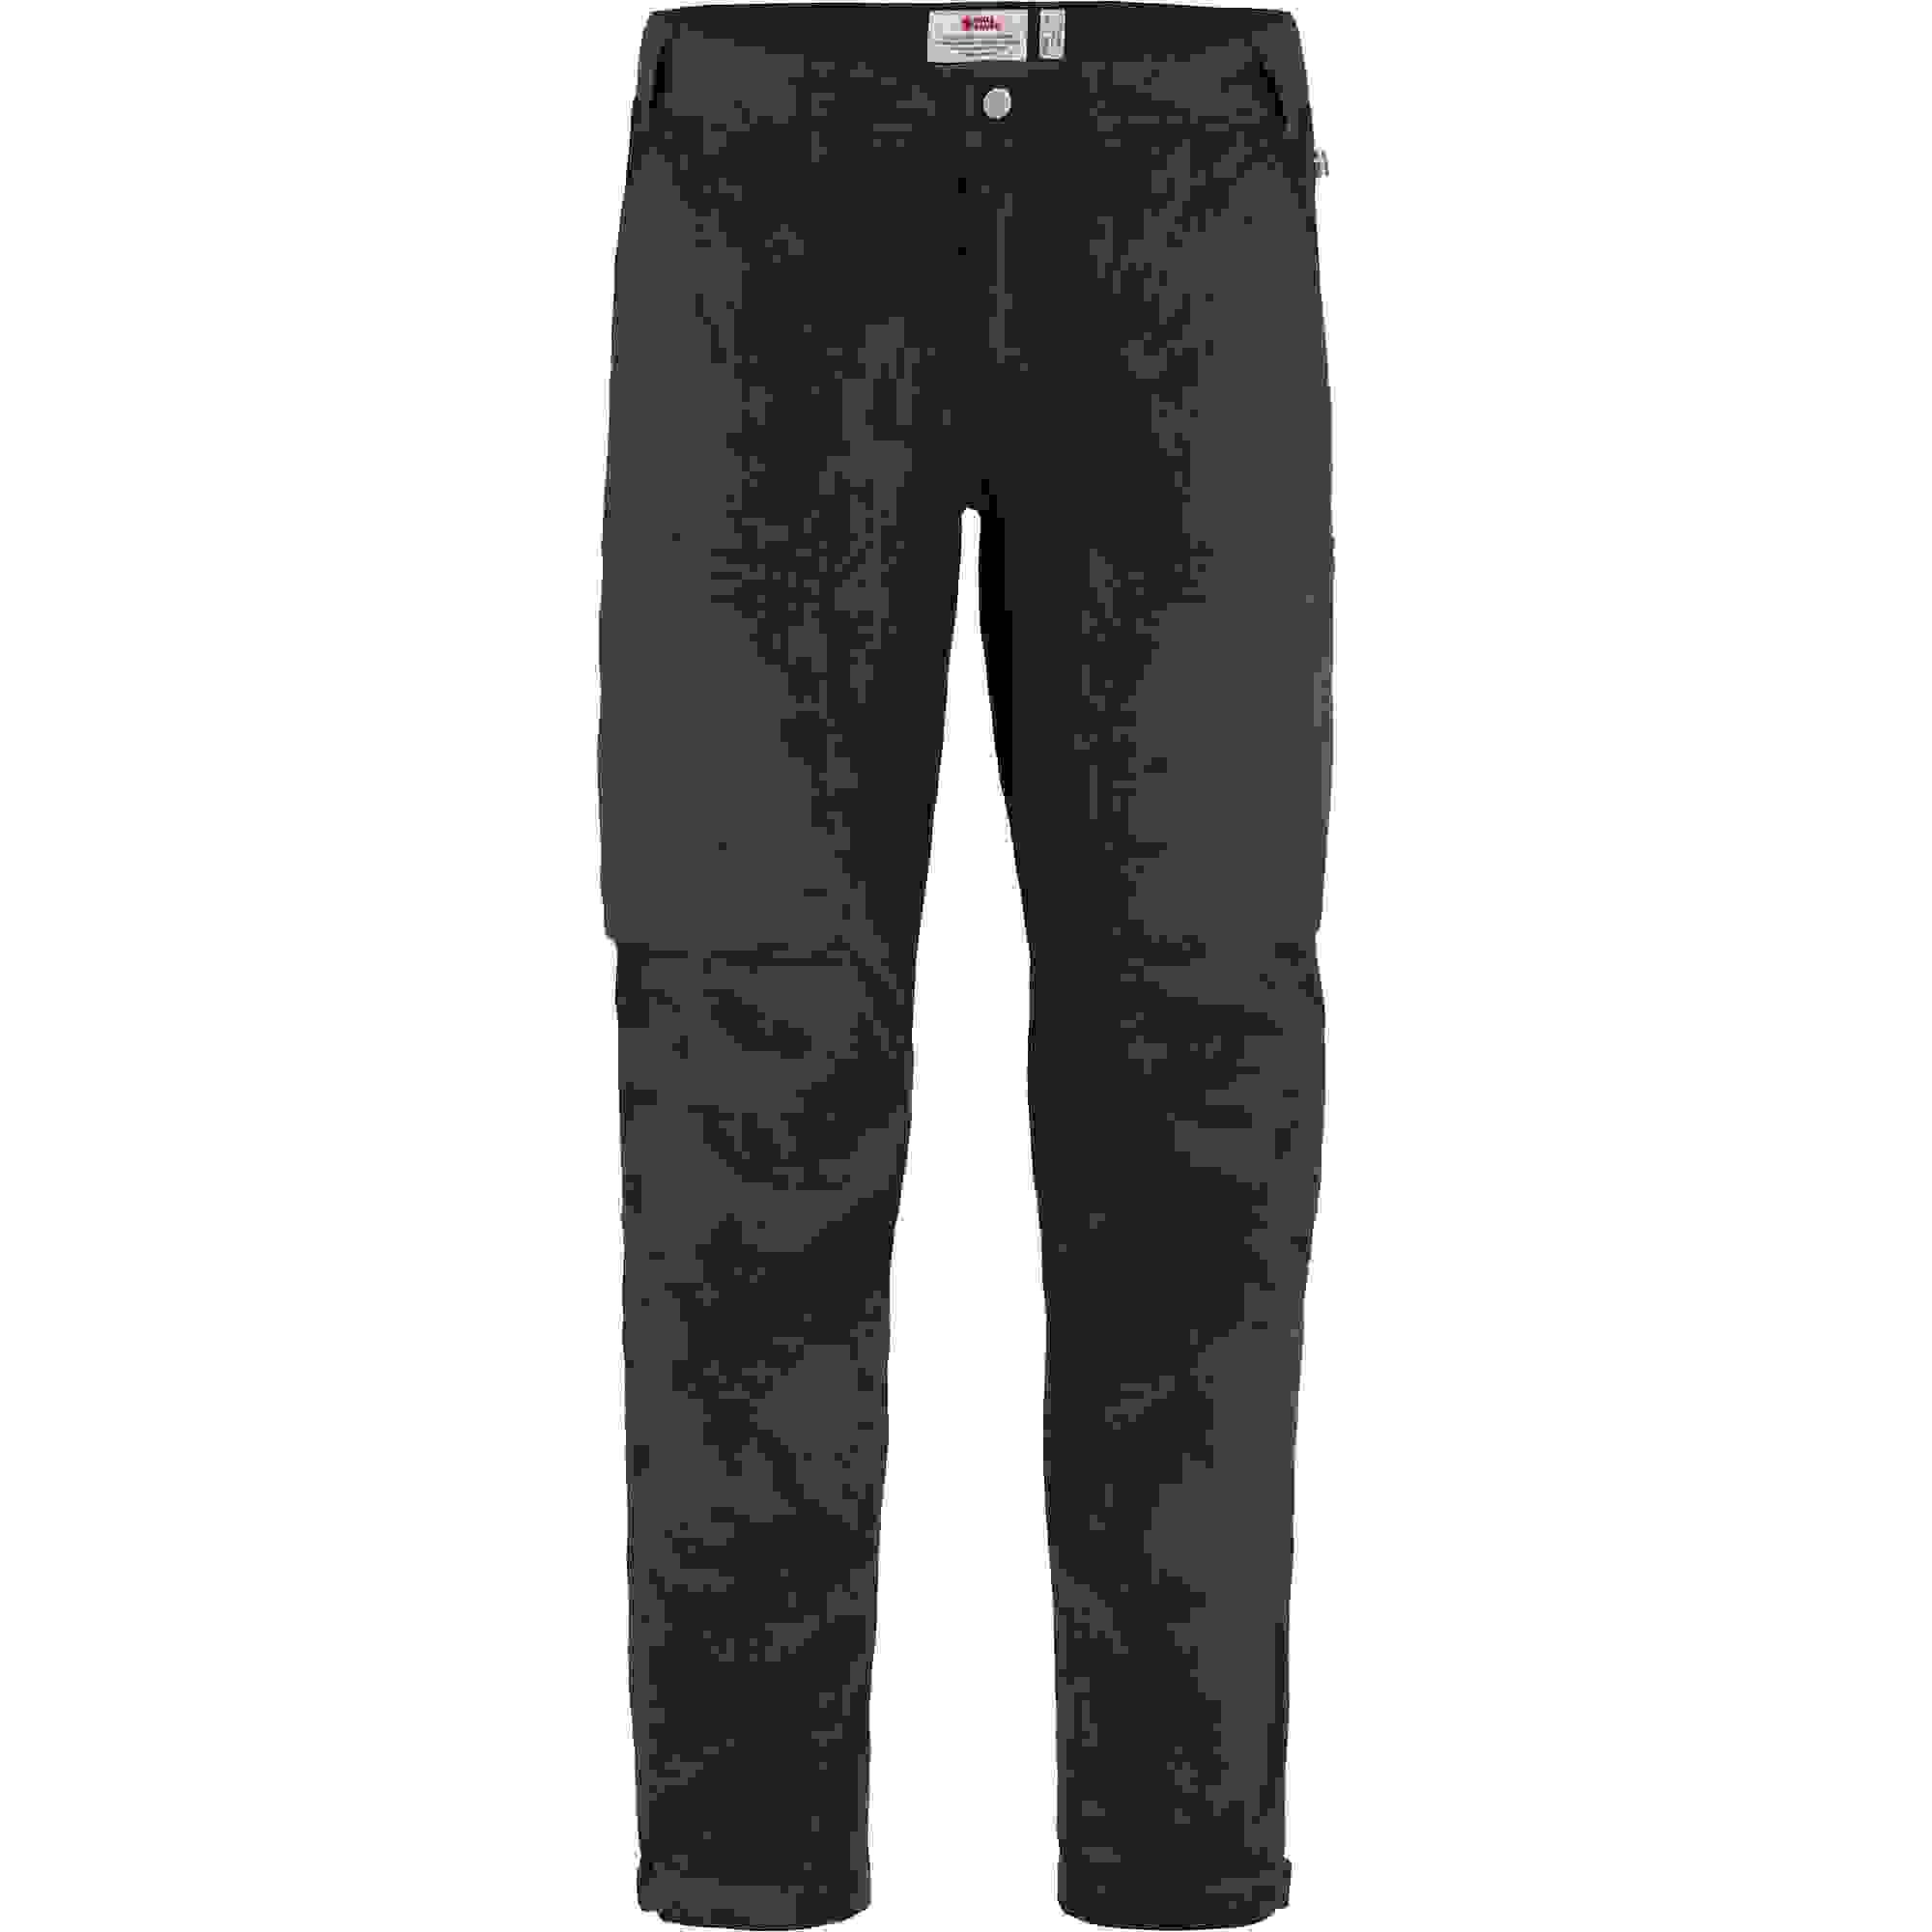 Fjällräven Abisko Stretch trousers señora pantalones de trekking pantalones outdoor-Pant senderismo